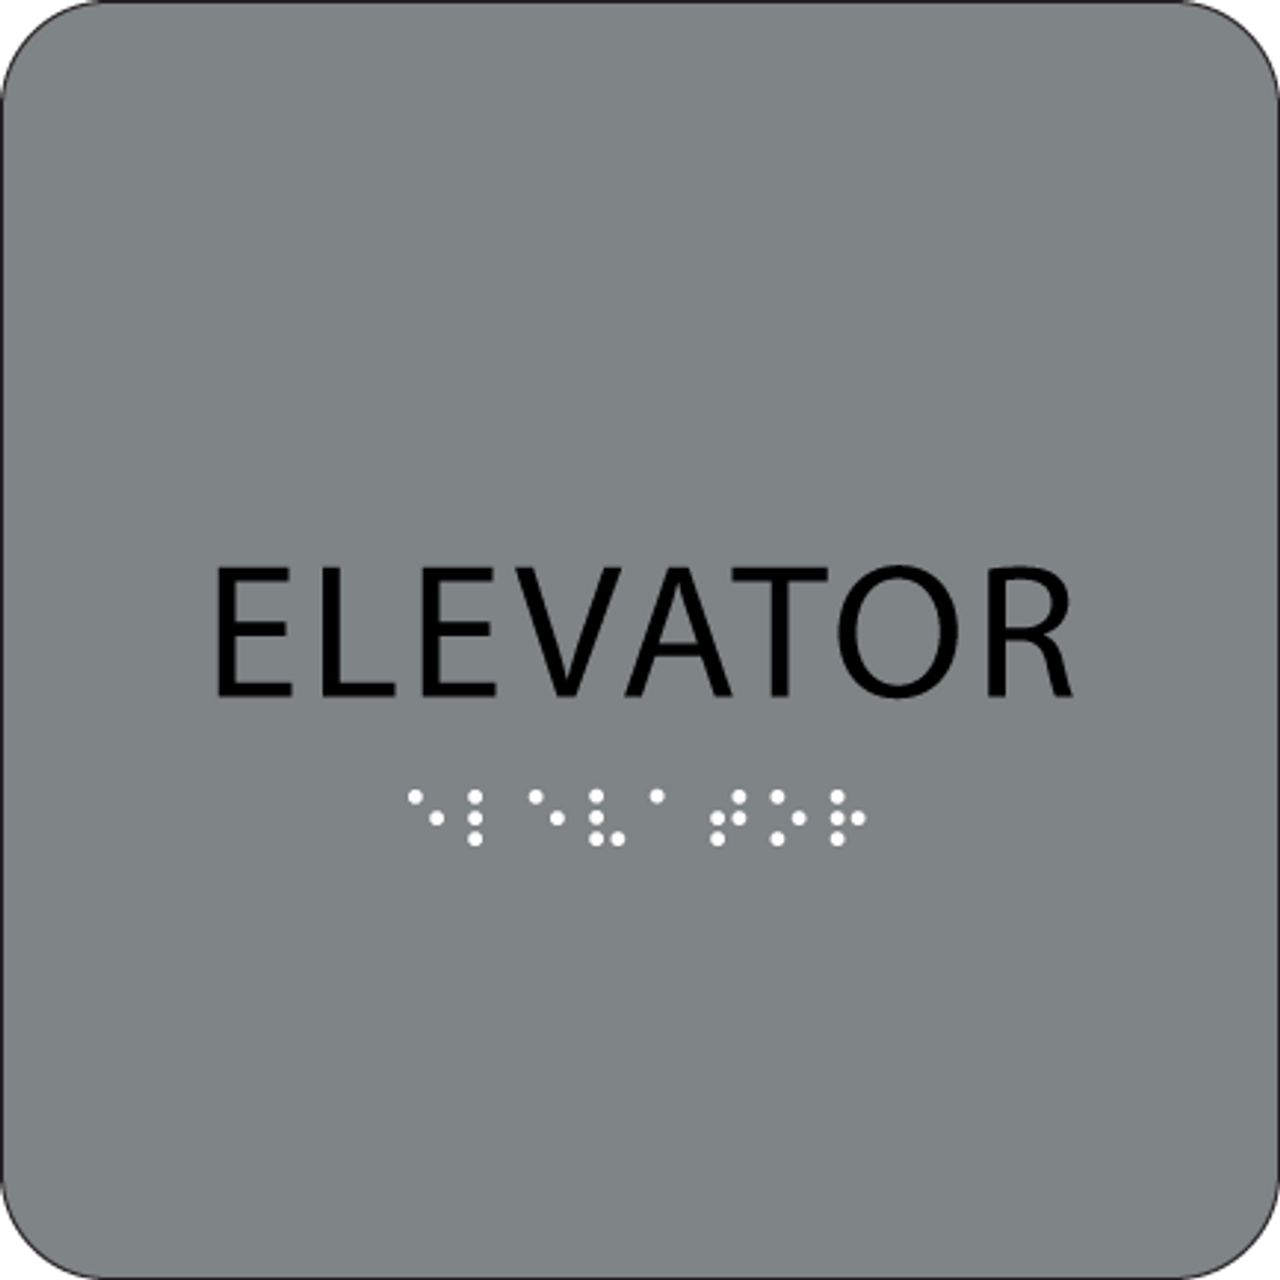 Grey Tactile Elevator Sign